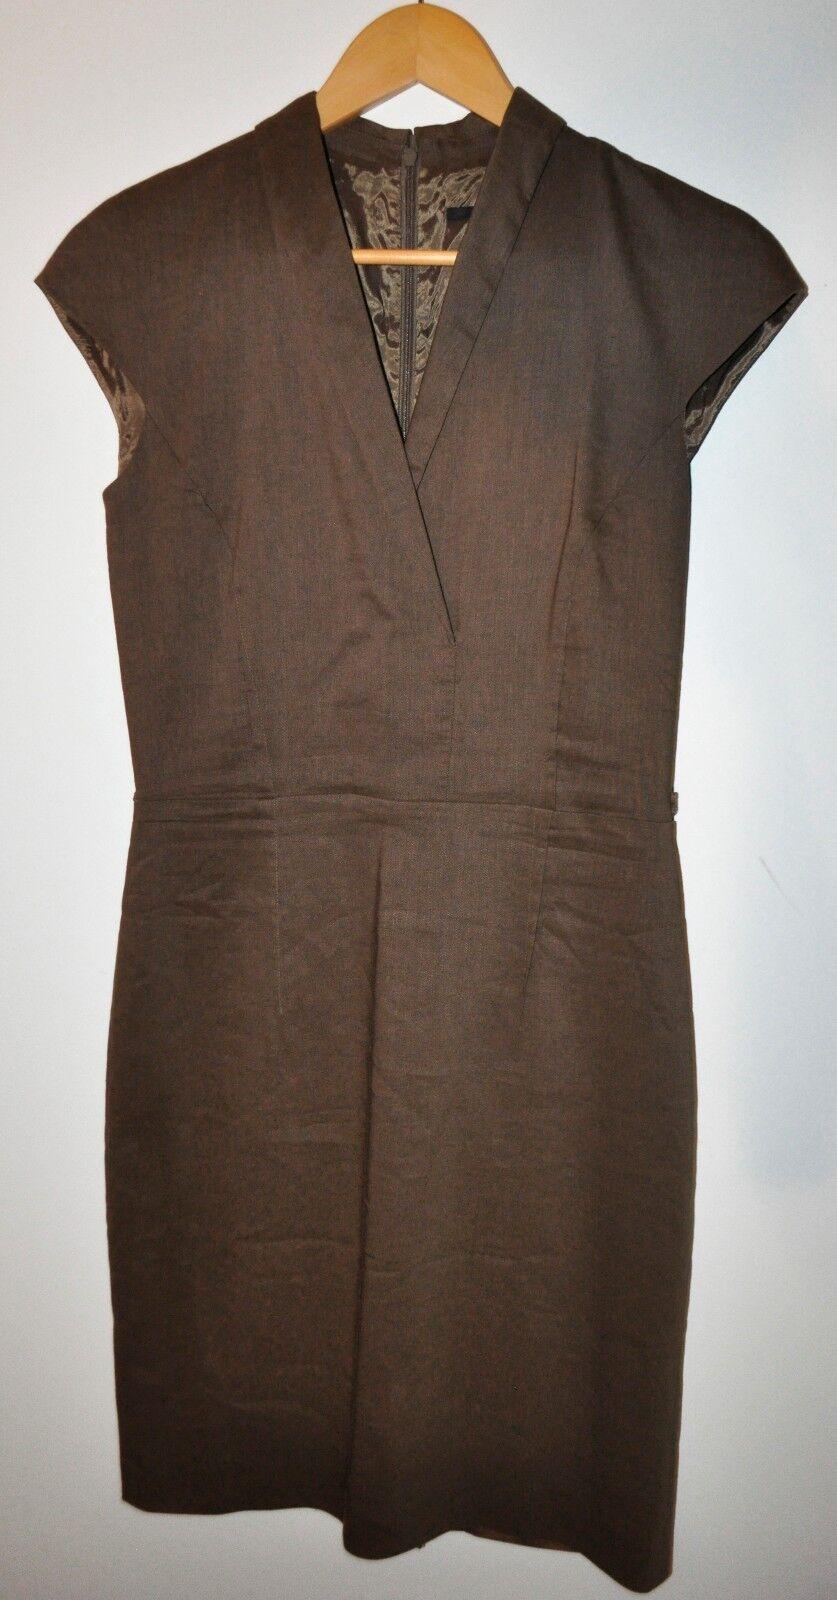 Hugo Boss Daryn Brown   Beige Cap Sleeve Wool Linen Sheath Dress Size 4 STUNNING